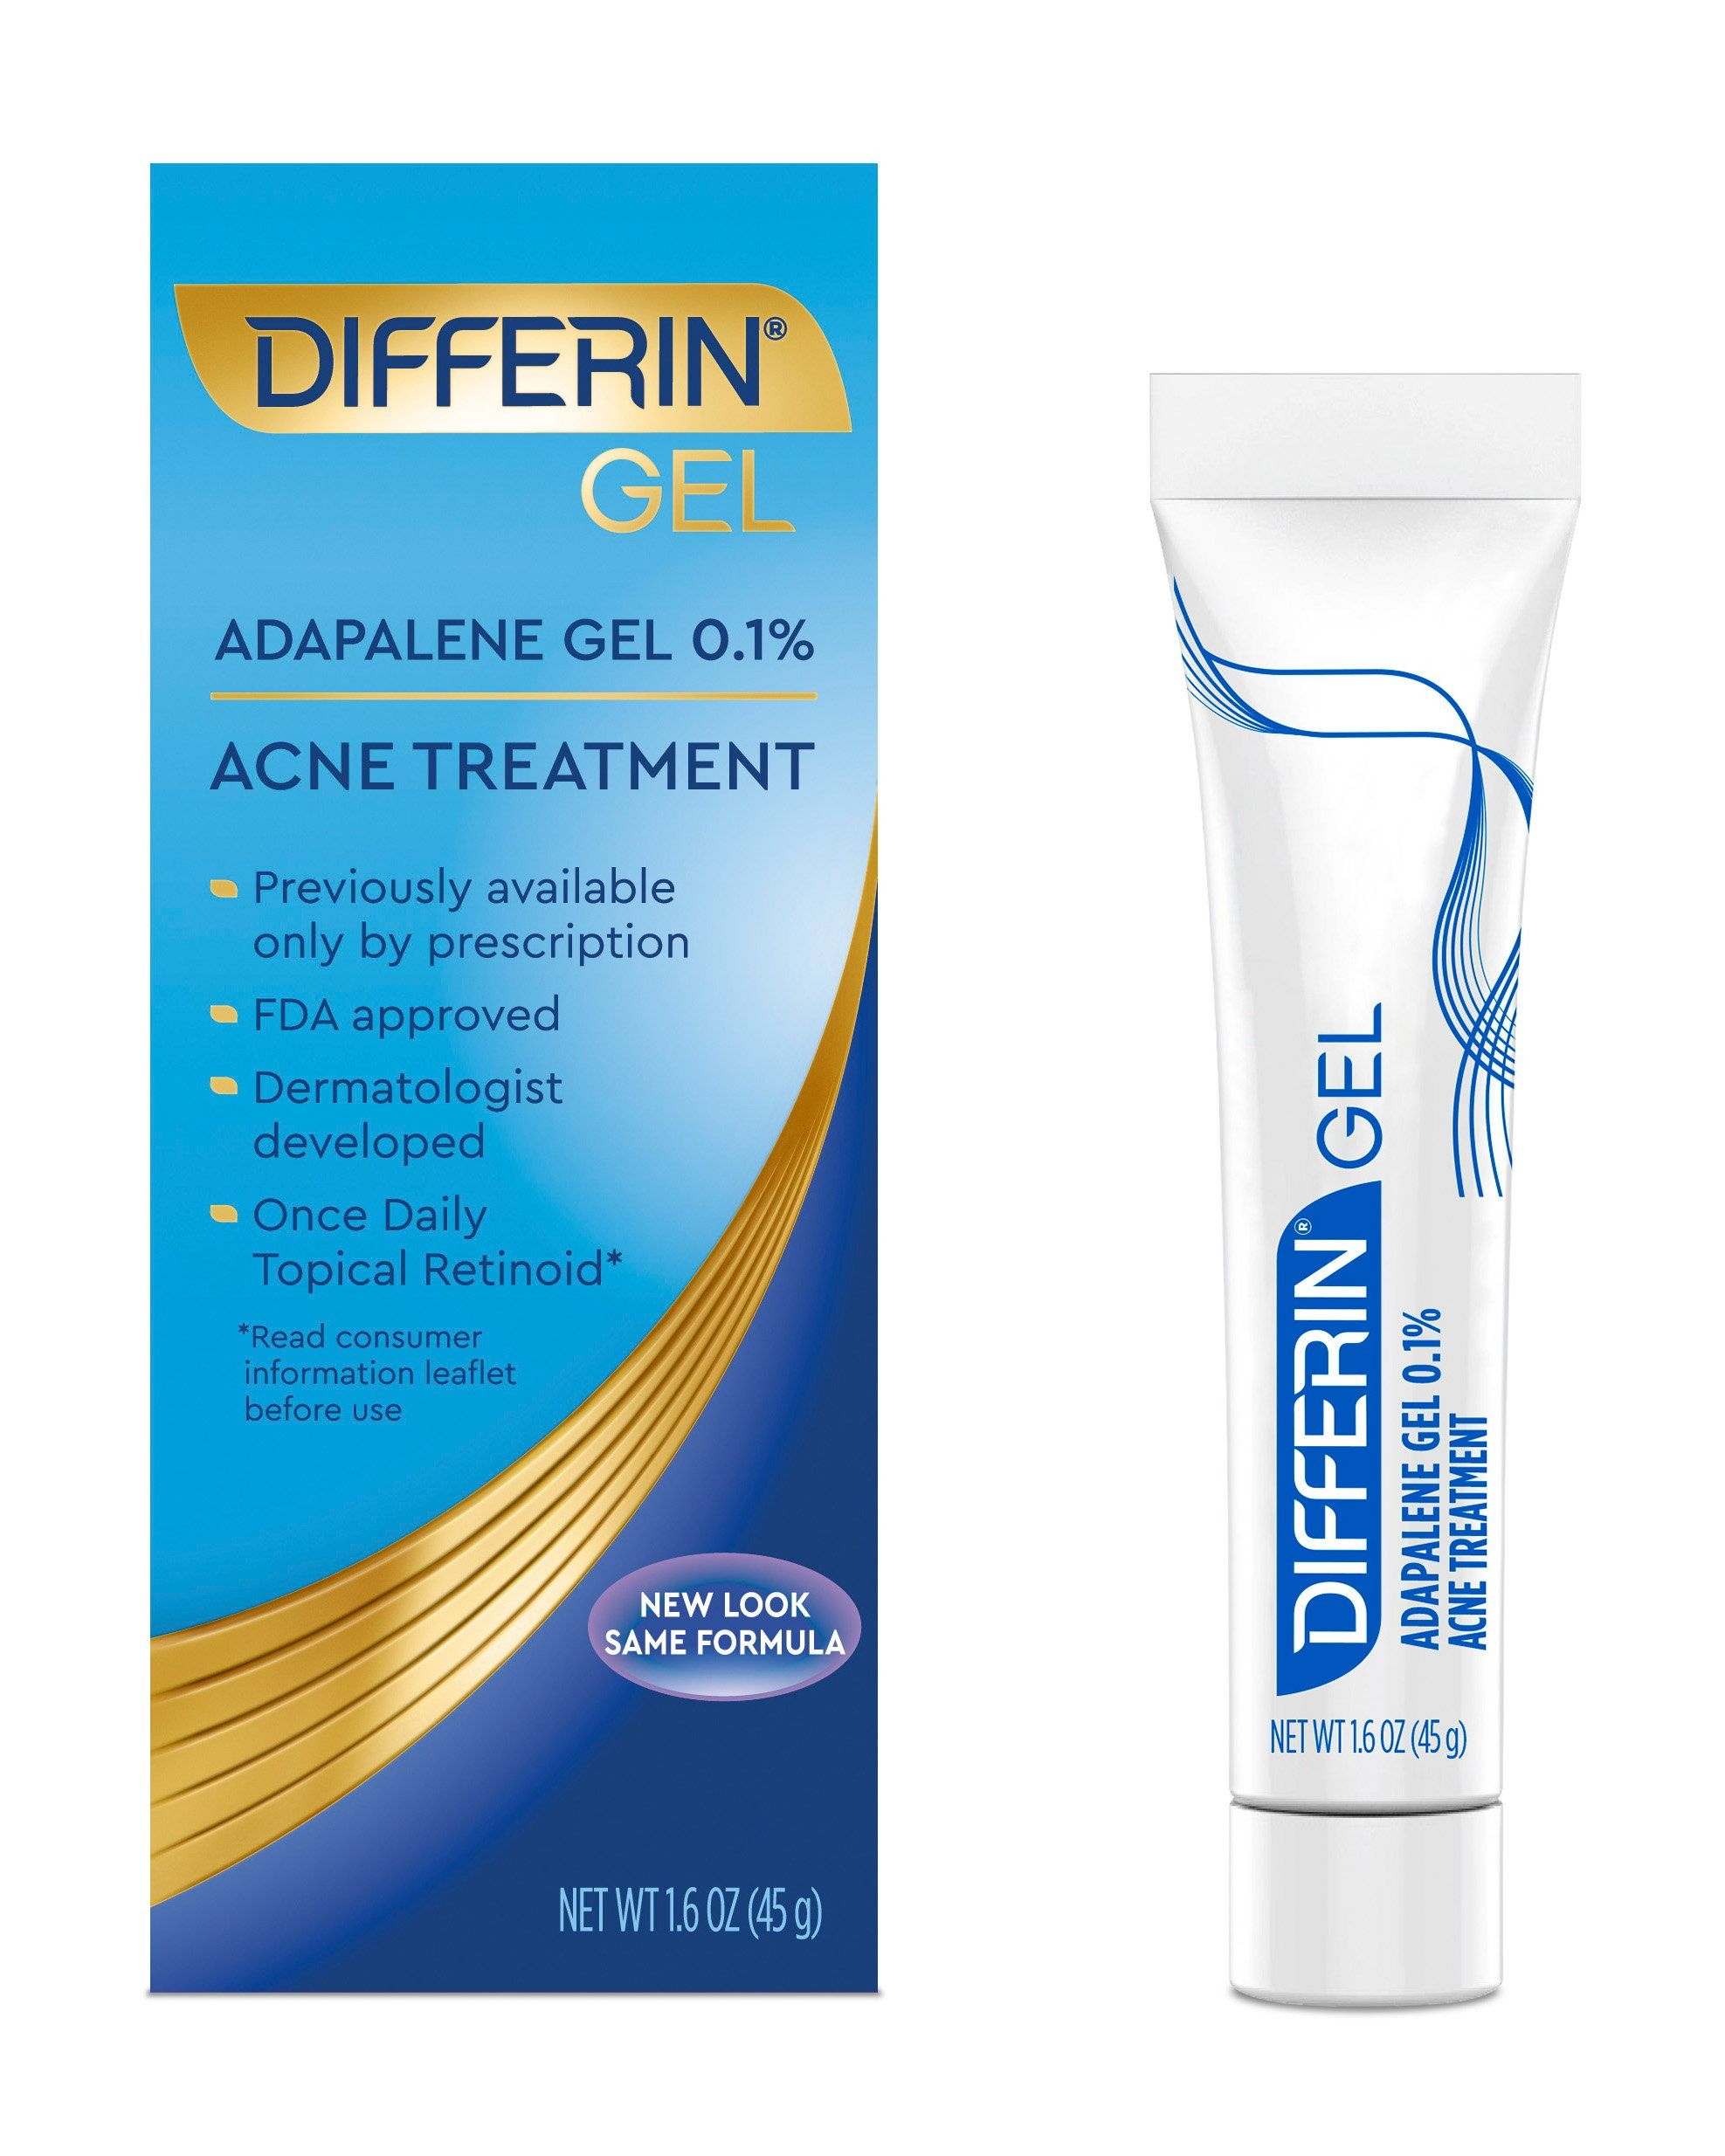 Differin Acne Treatment Gel Acne Treatment Differin Gel Skin Care